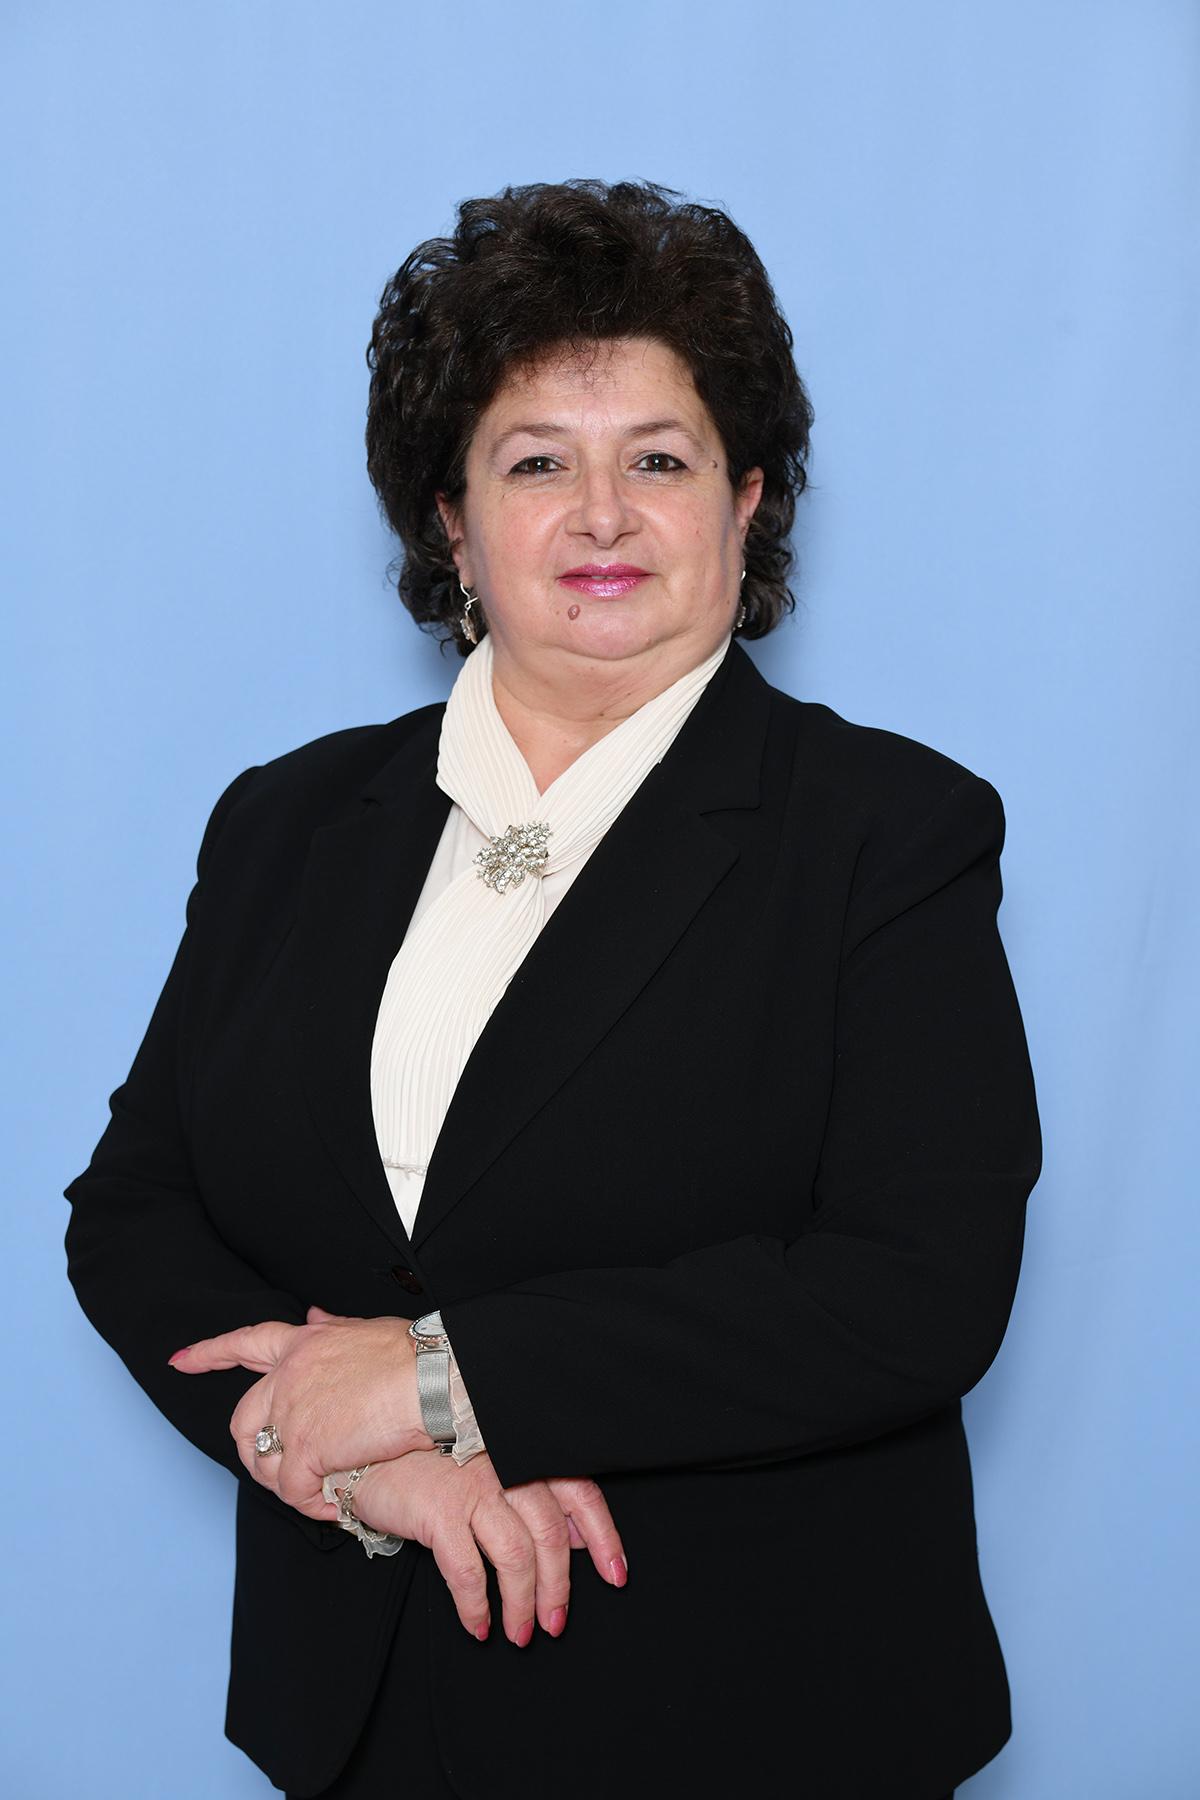 Милијана Петровић